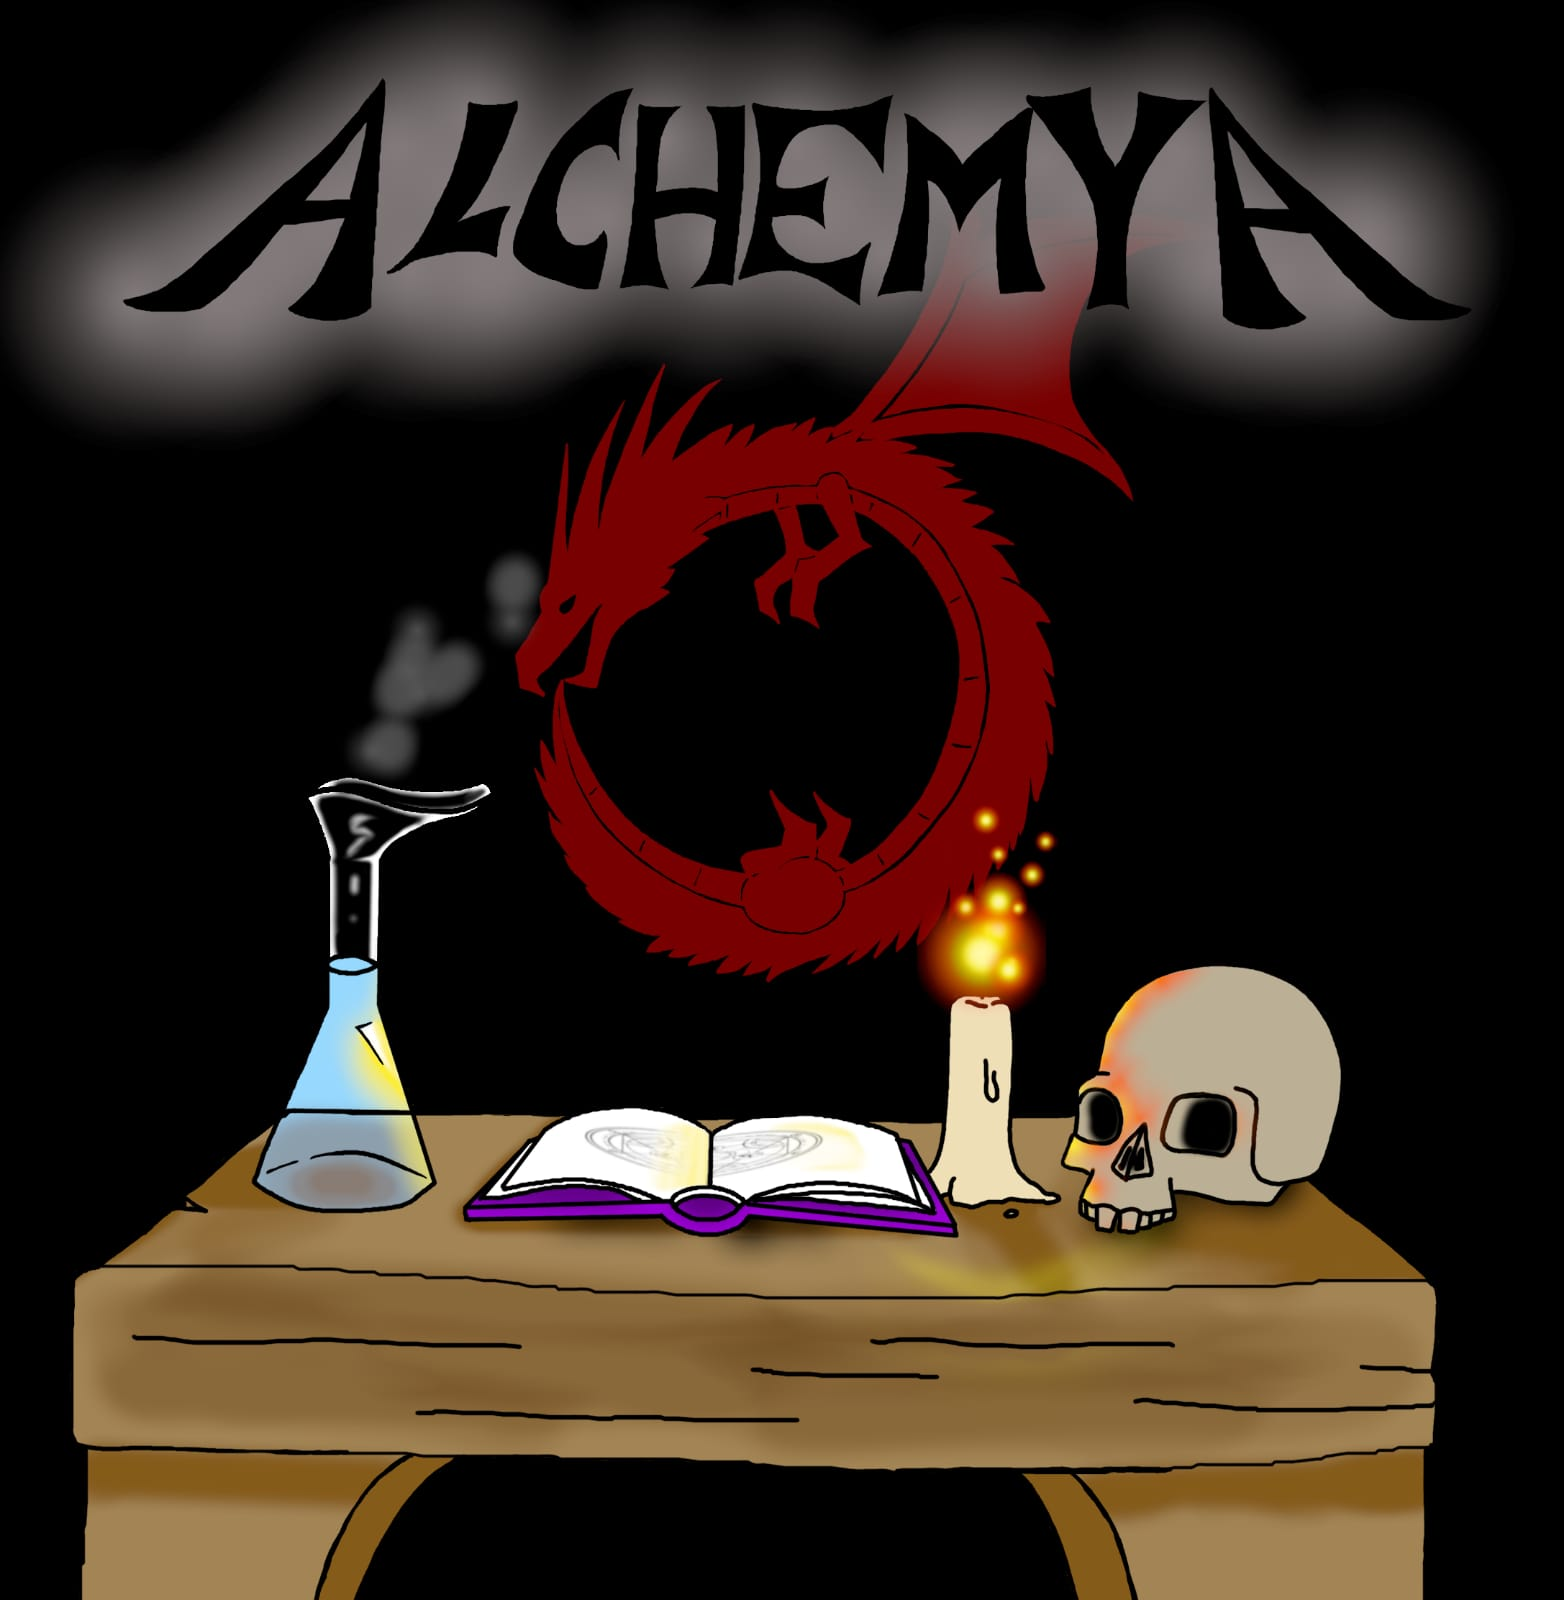 Alchemya: IRDA @ Discord Roleplay Day